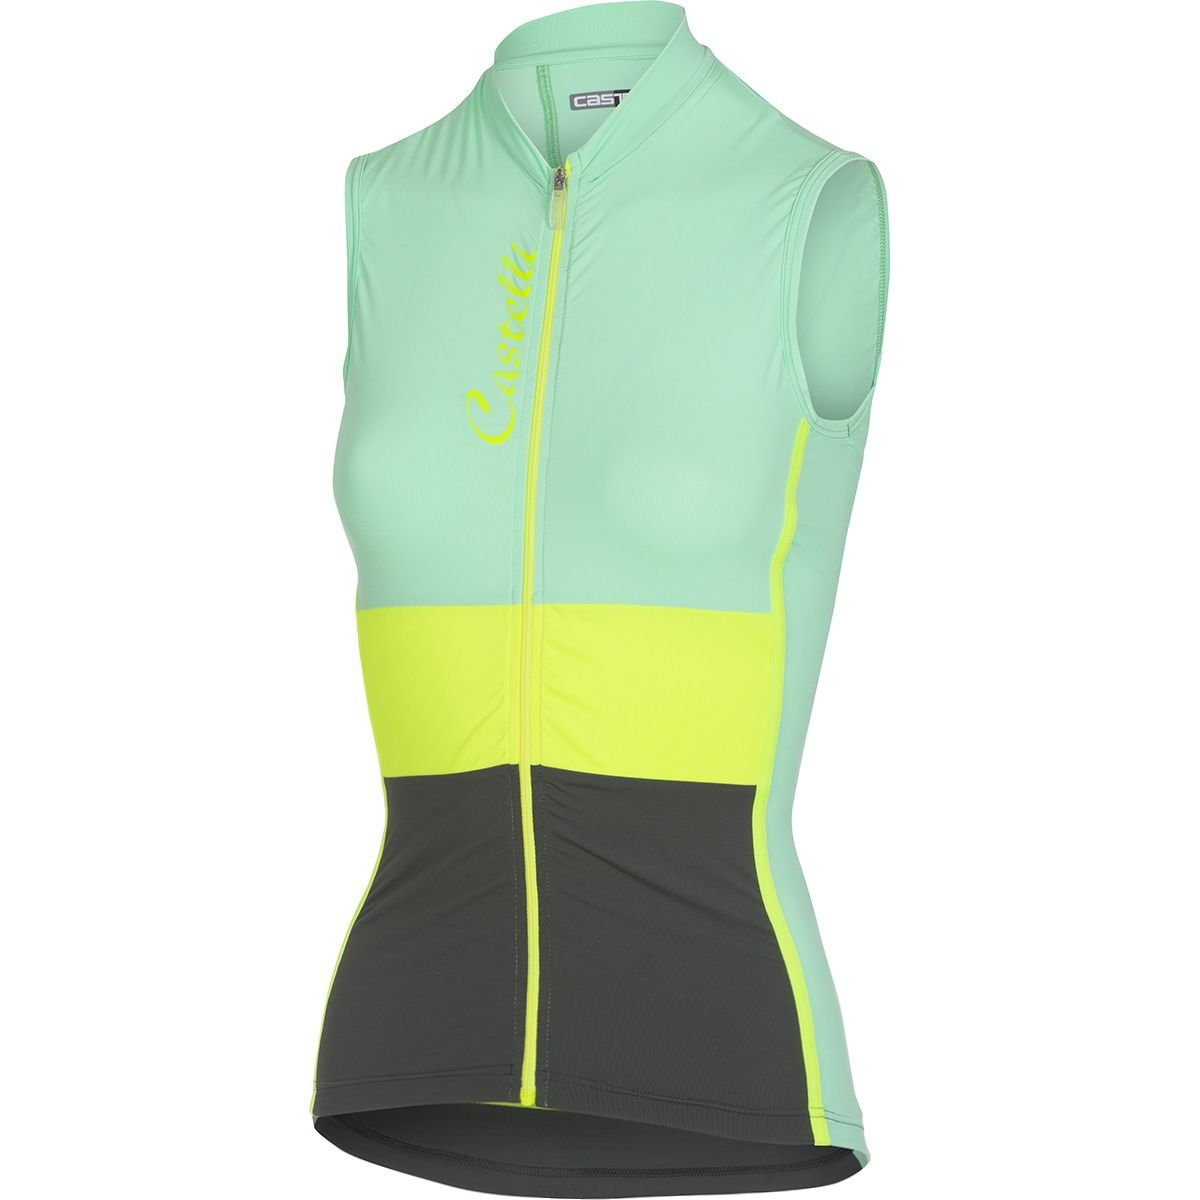 Castelli 2017 レディース Protagonistaノースリーブサイクリングジャージ - A17066 B079C53LLV Small|Pastel Mint/Yellow Fluo/Forest Gray Pastel Mint/Yellow Fluo/Forest Gray Small